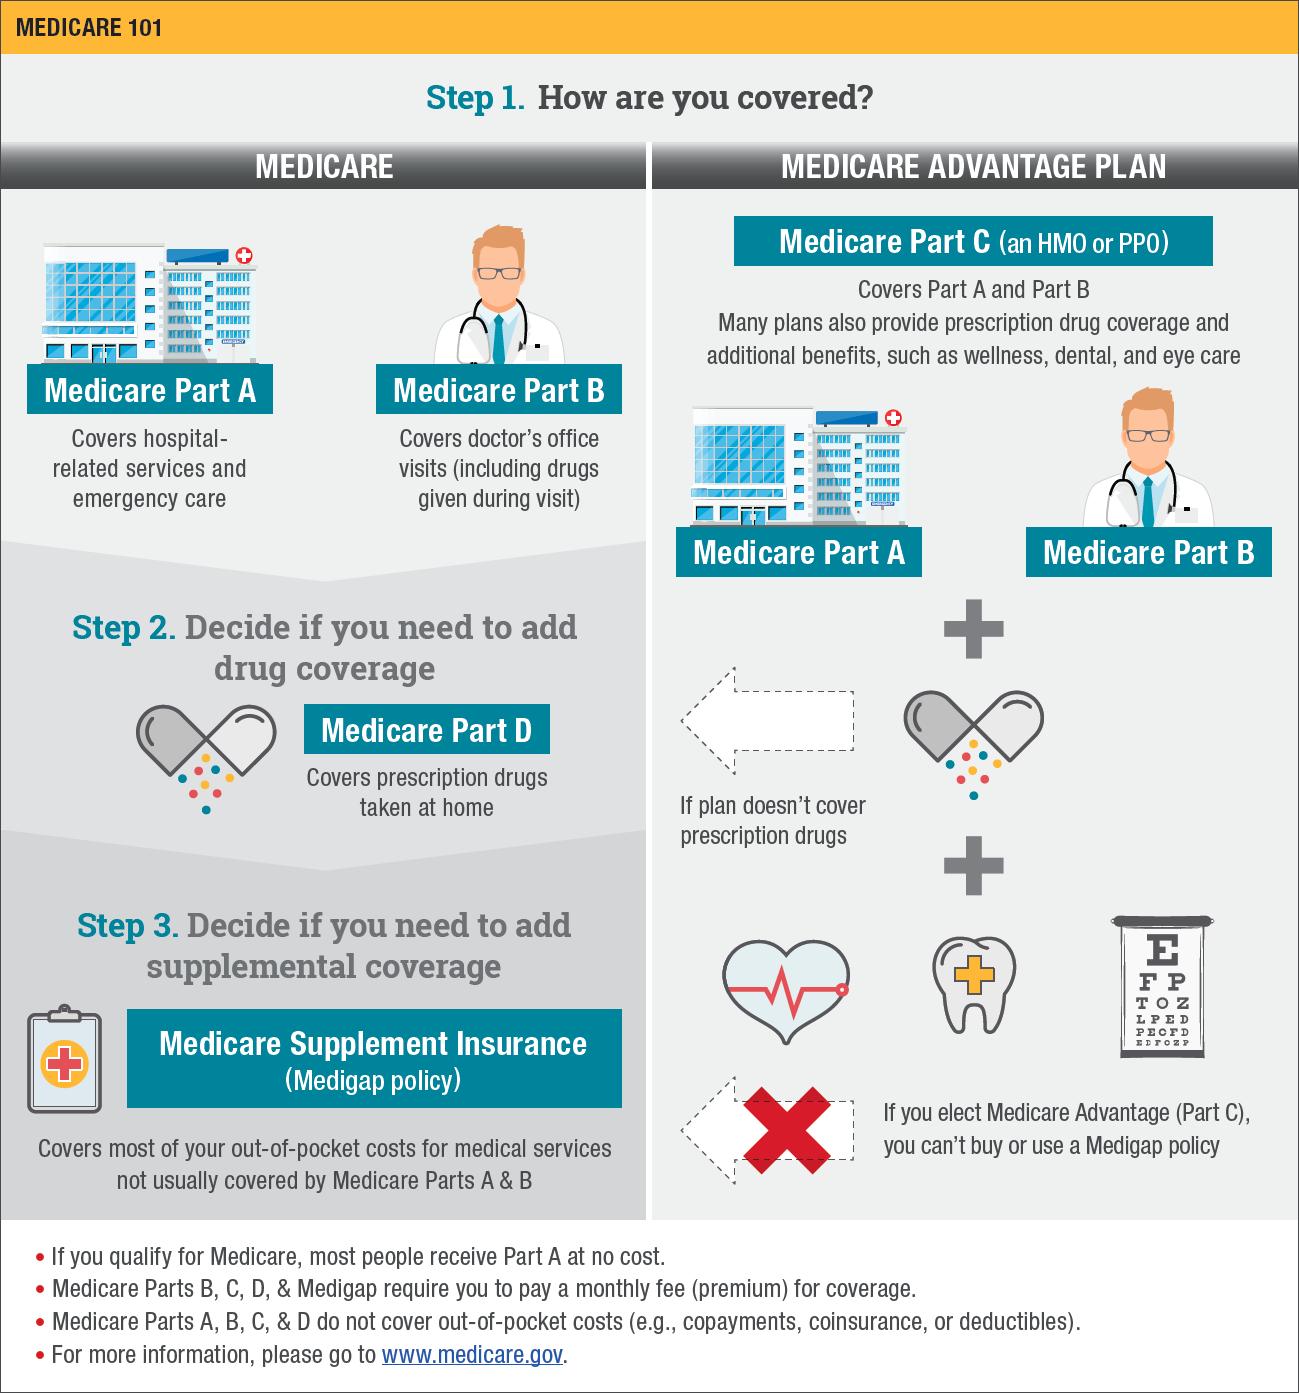 Medicare 101 Infographic